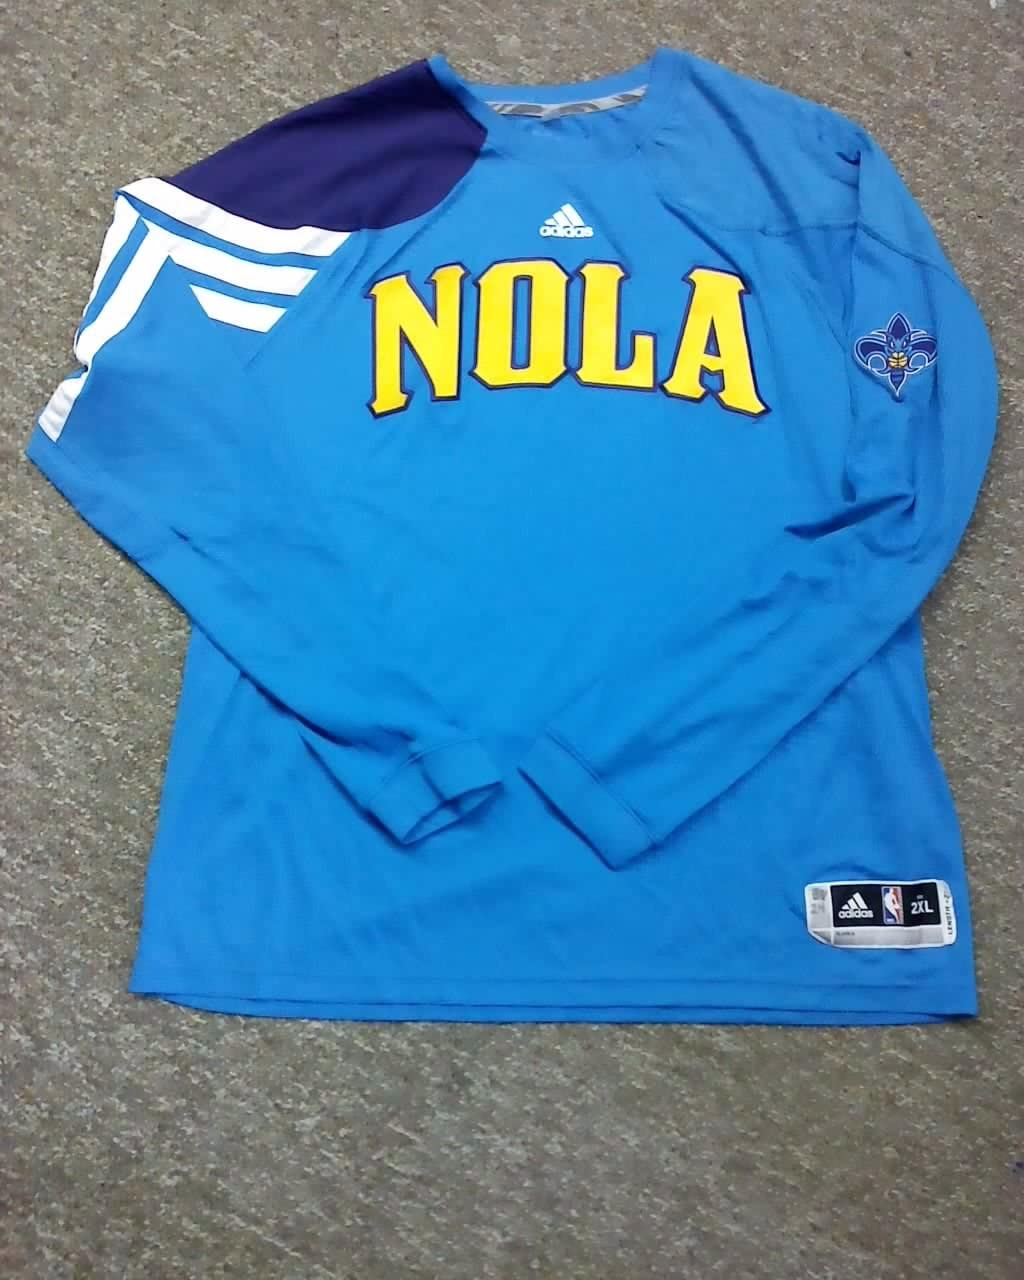 Carl Landry New Orleans Hornets 2011-2012 NOLA Game Worn L/S Shooting Shirt